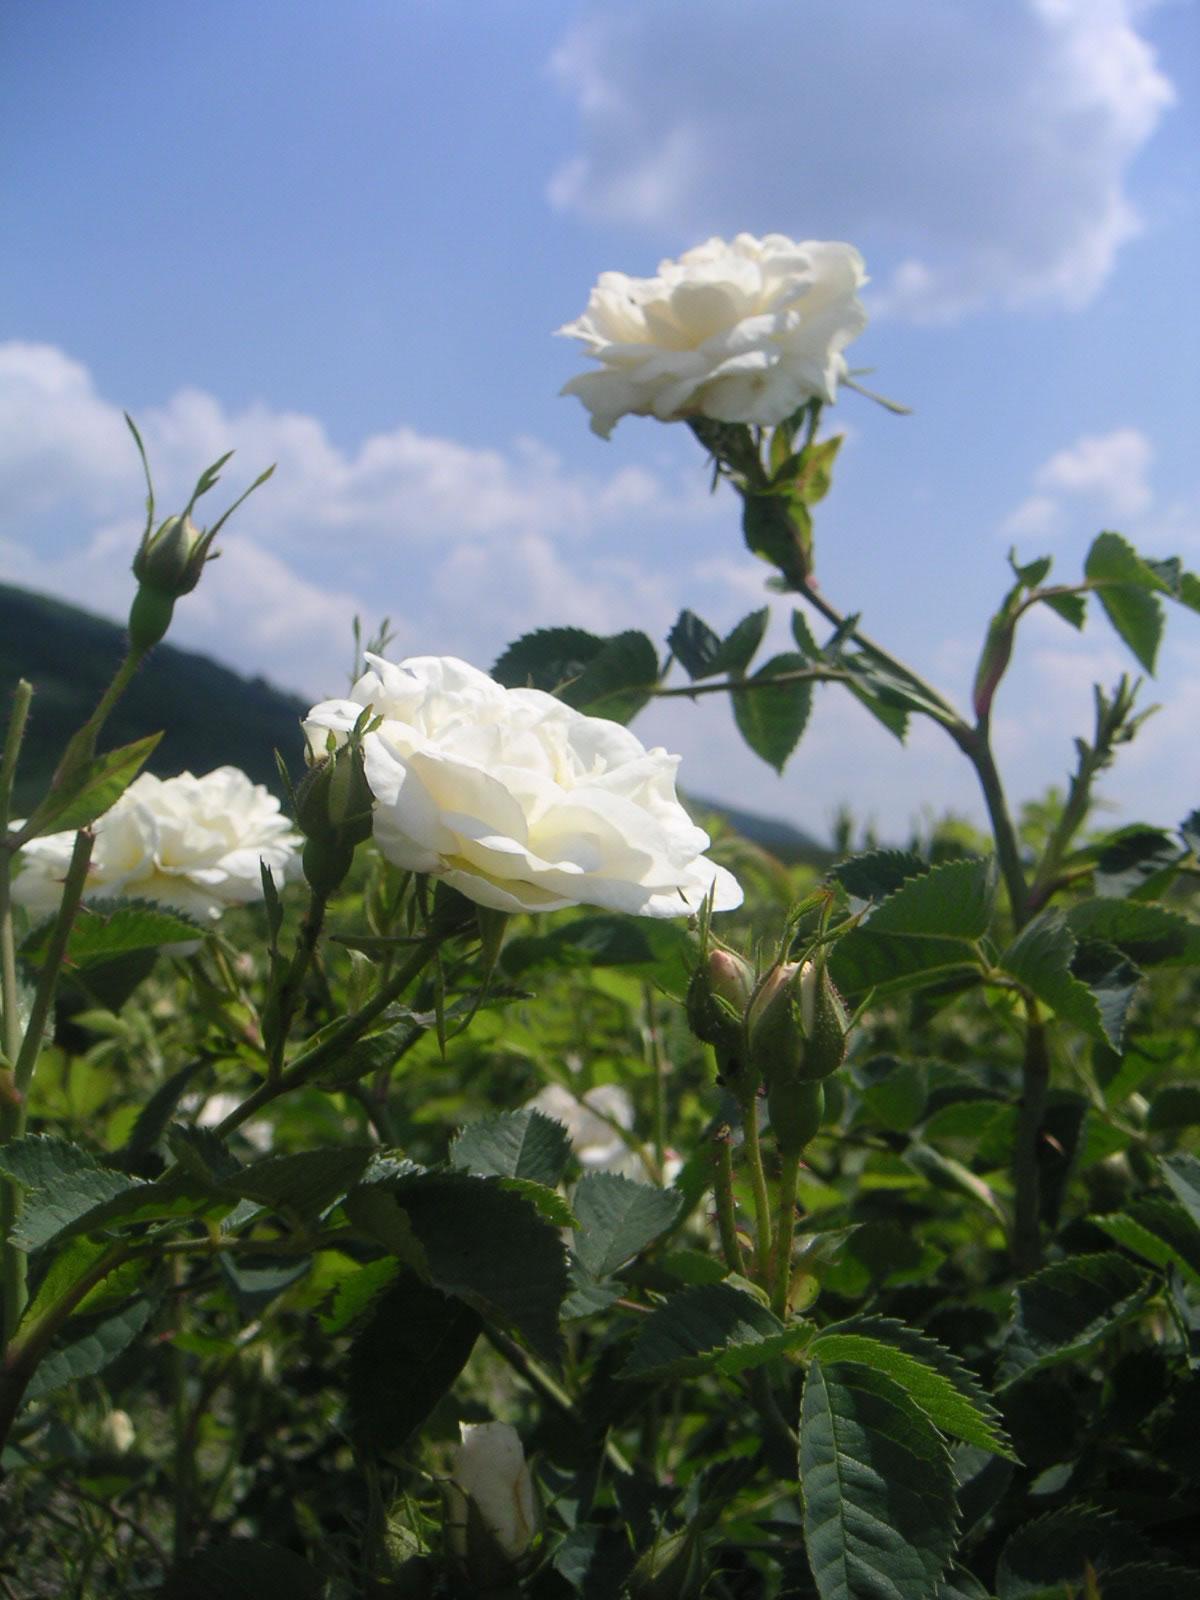 Forum on this topic: Bojana Novakovic, teresa-hill/